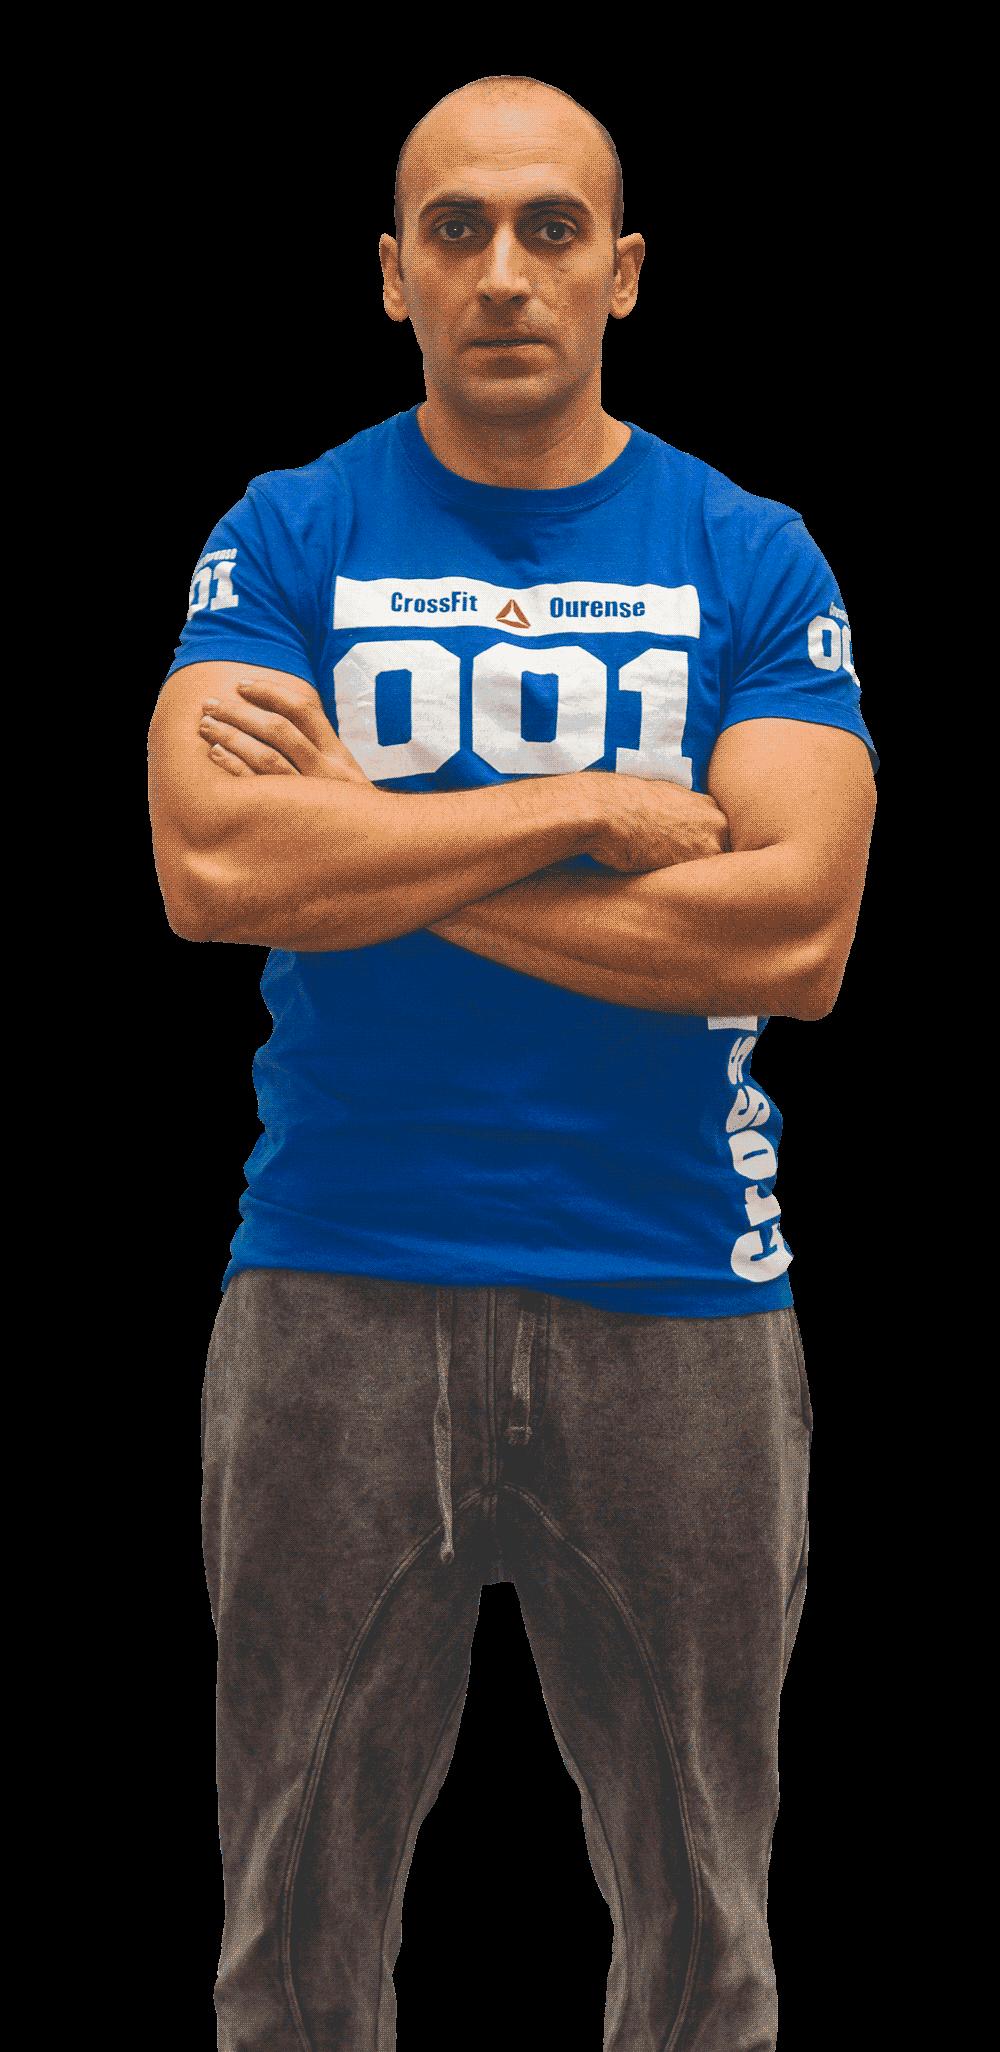 Rubén González CrossFit Ourense